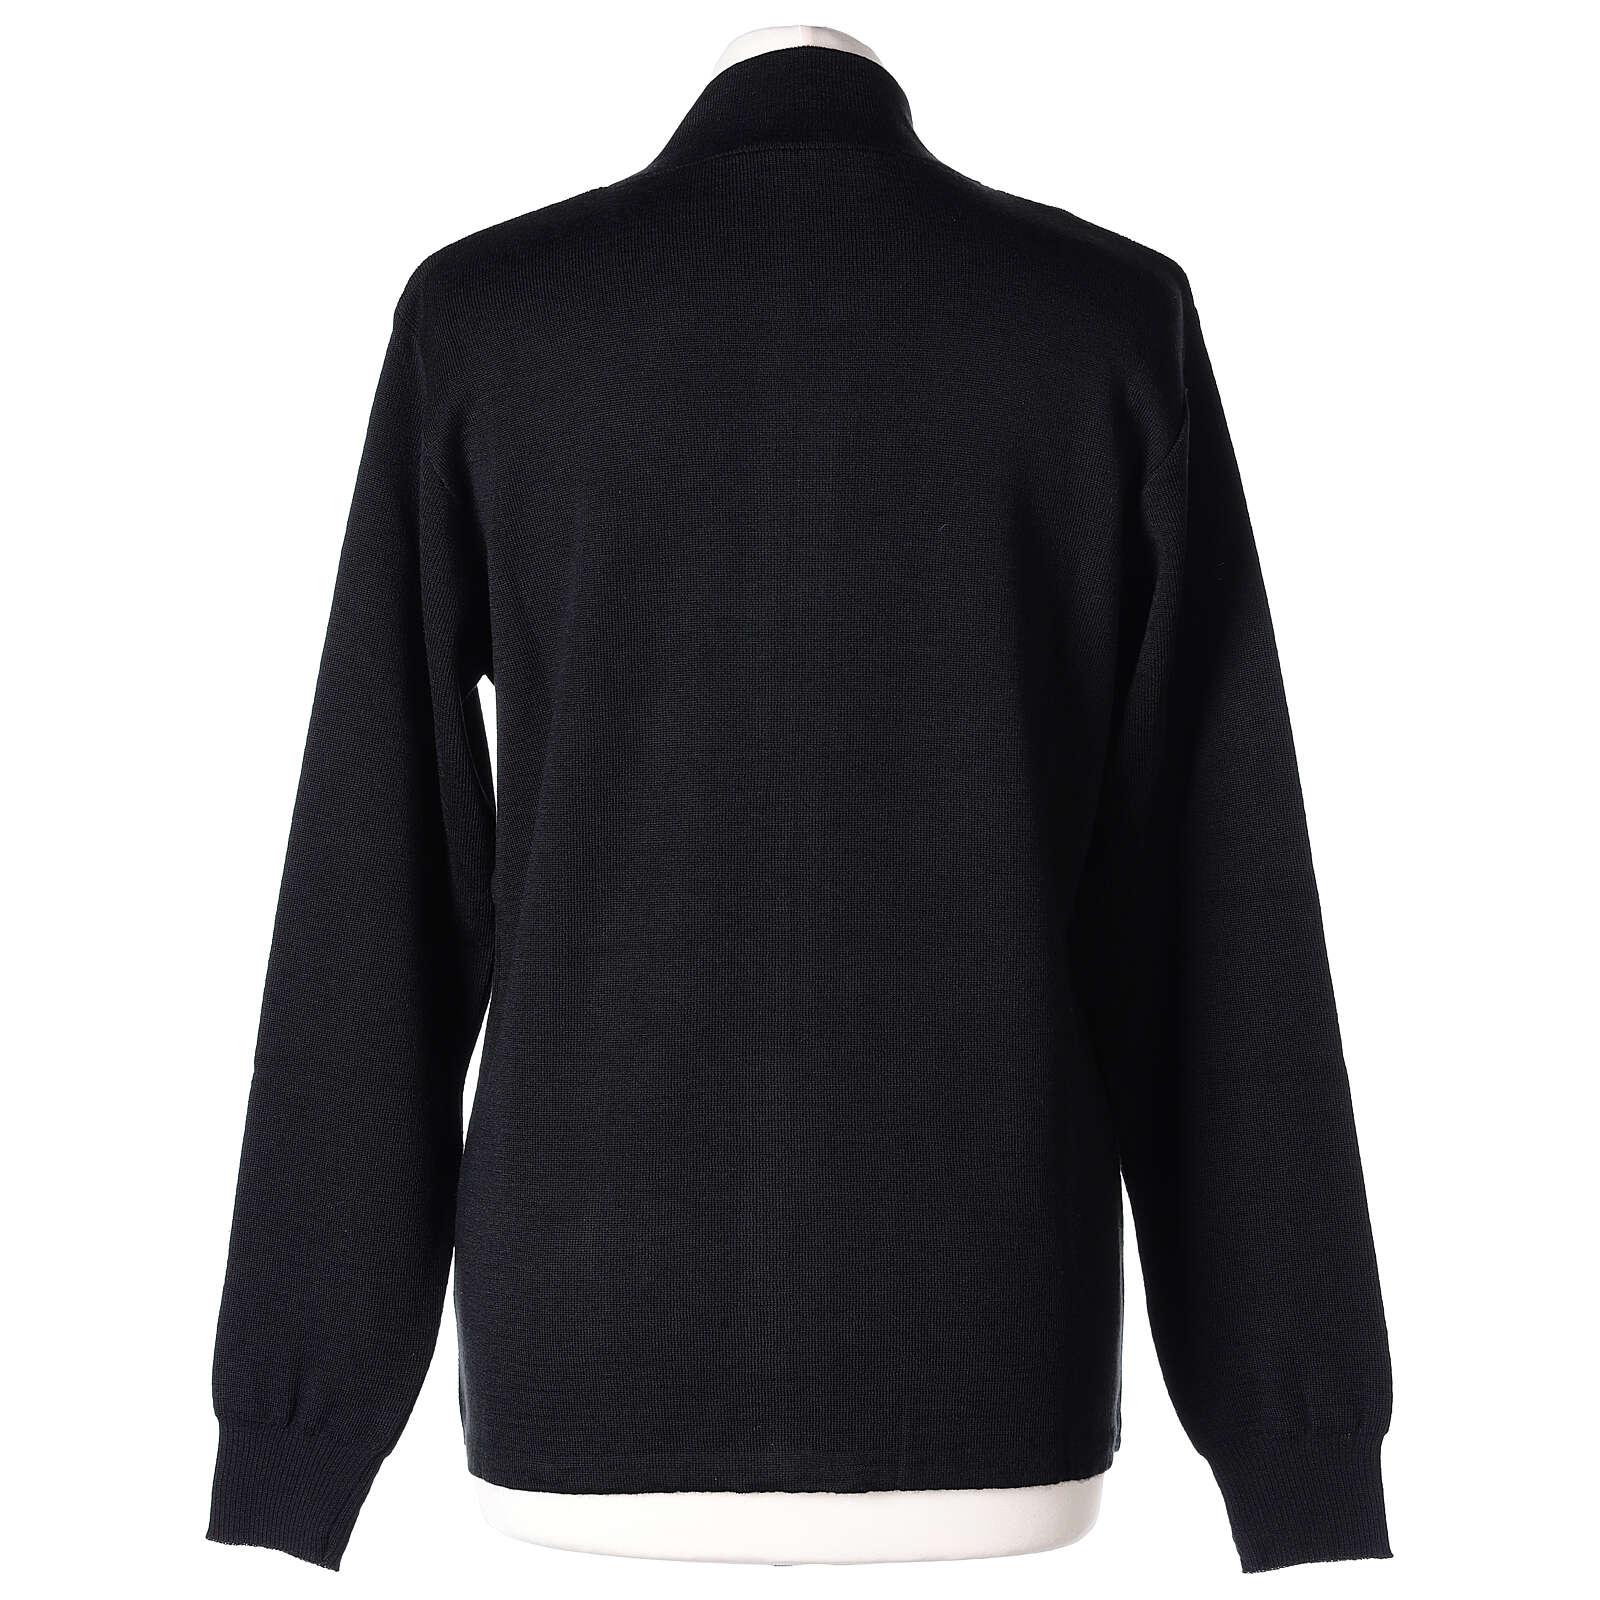 Chaqueta coreana con cremallera 50% acrílico 50% lana merina negra monja In Primis 4